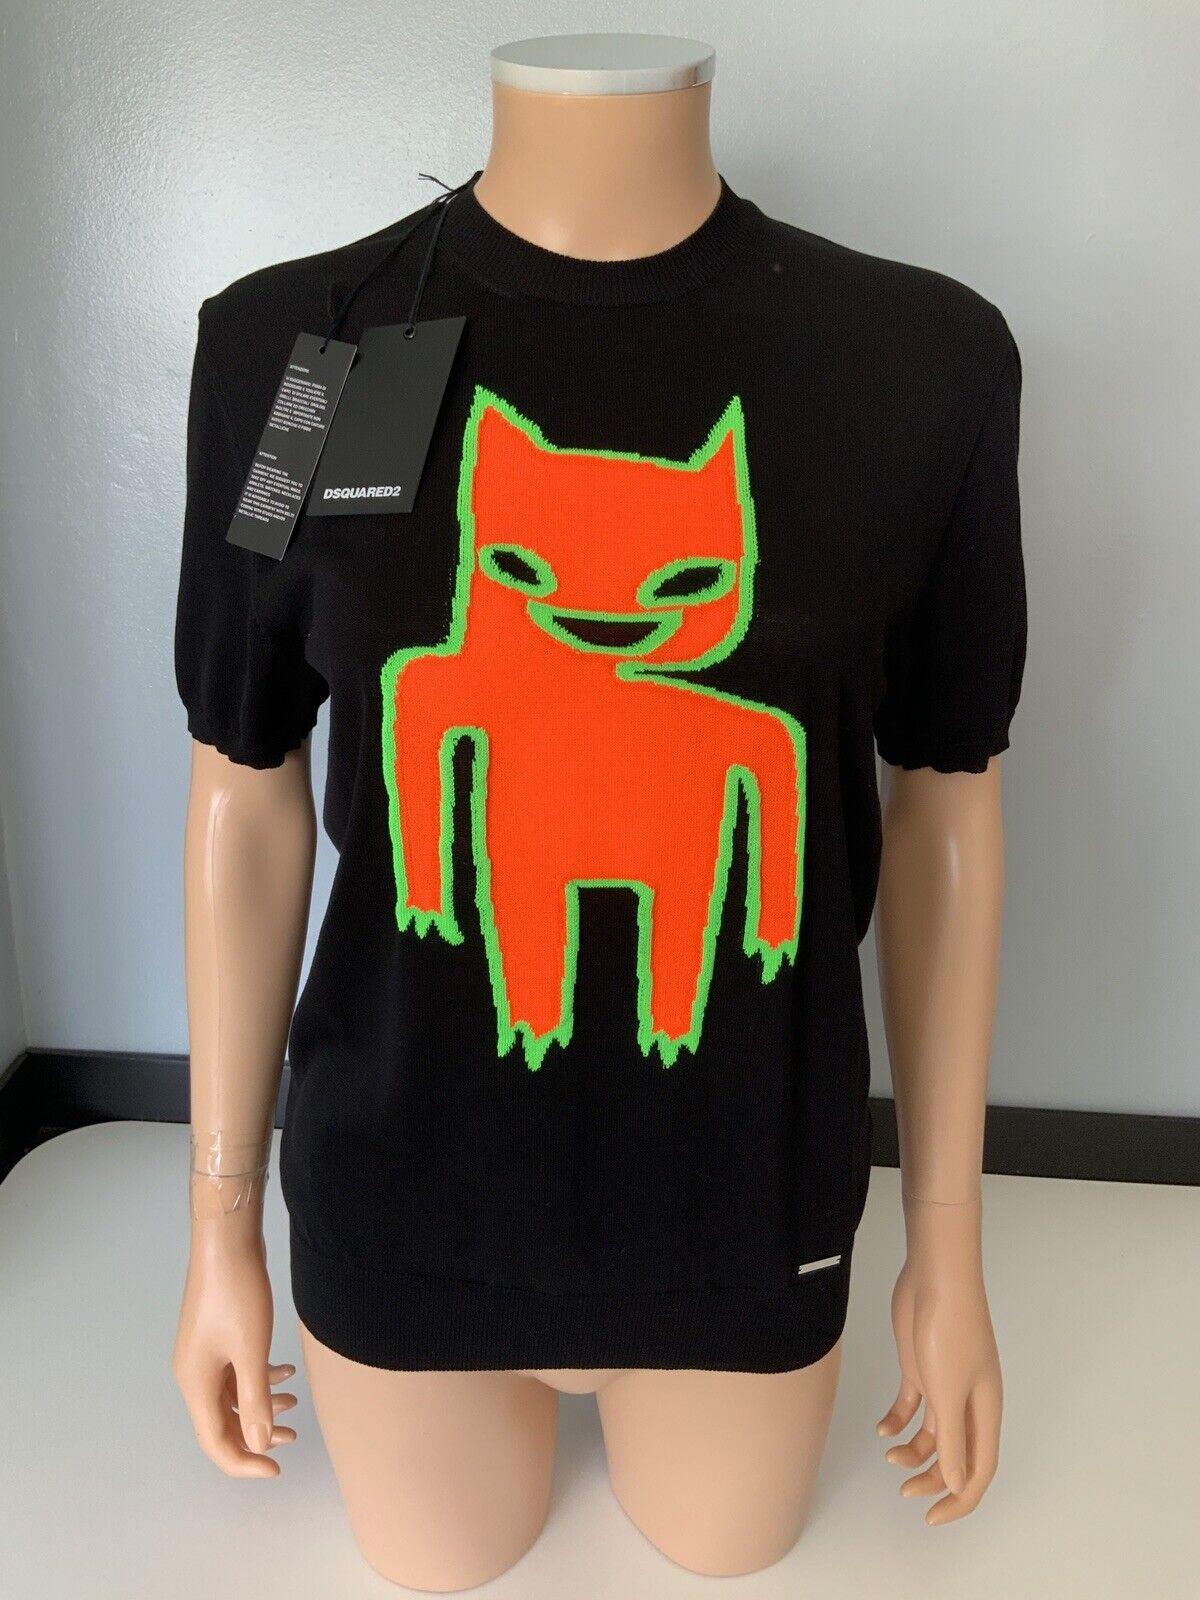 Dsquarot2 Ds2 damen Neon T Shirt Jumper, Top Größe Medium, schwarz, New